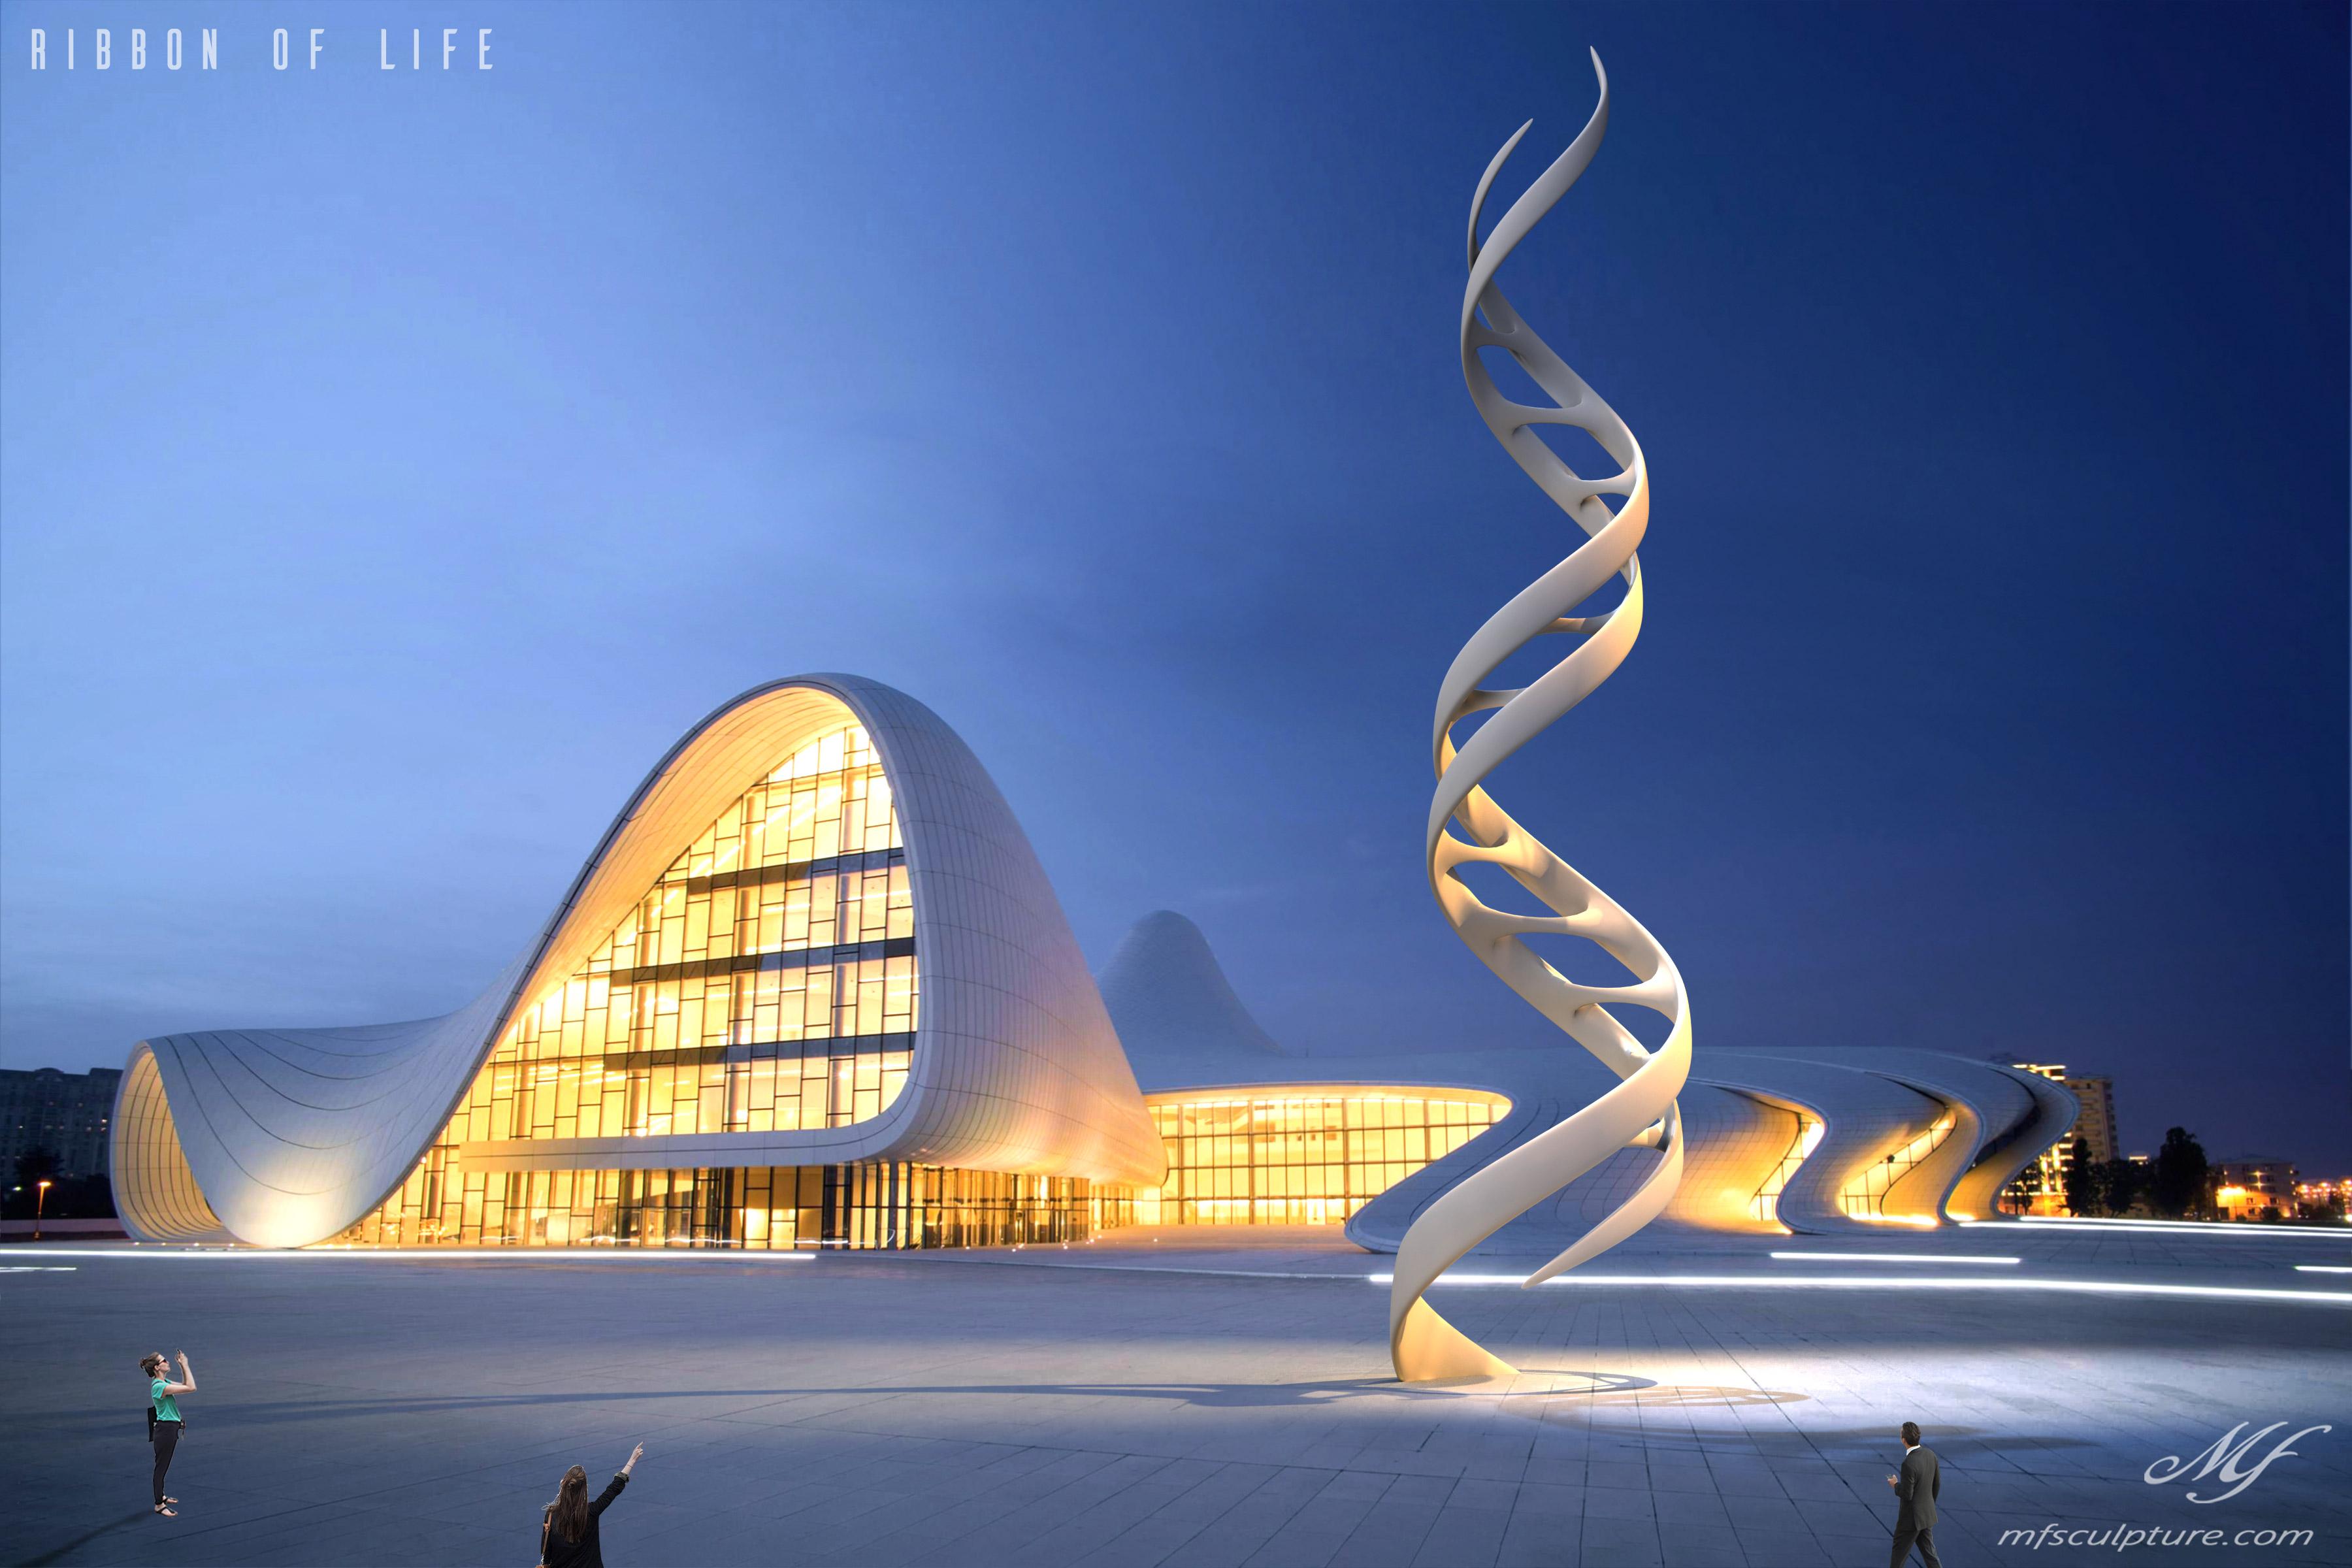 Heydar Aliyev Zaha Hadid Convergence Modern Sculpture Public Art DNA Ribbon of Life Science 3